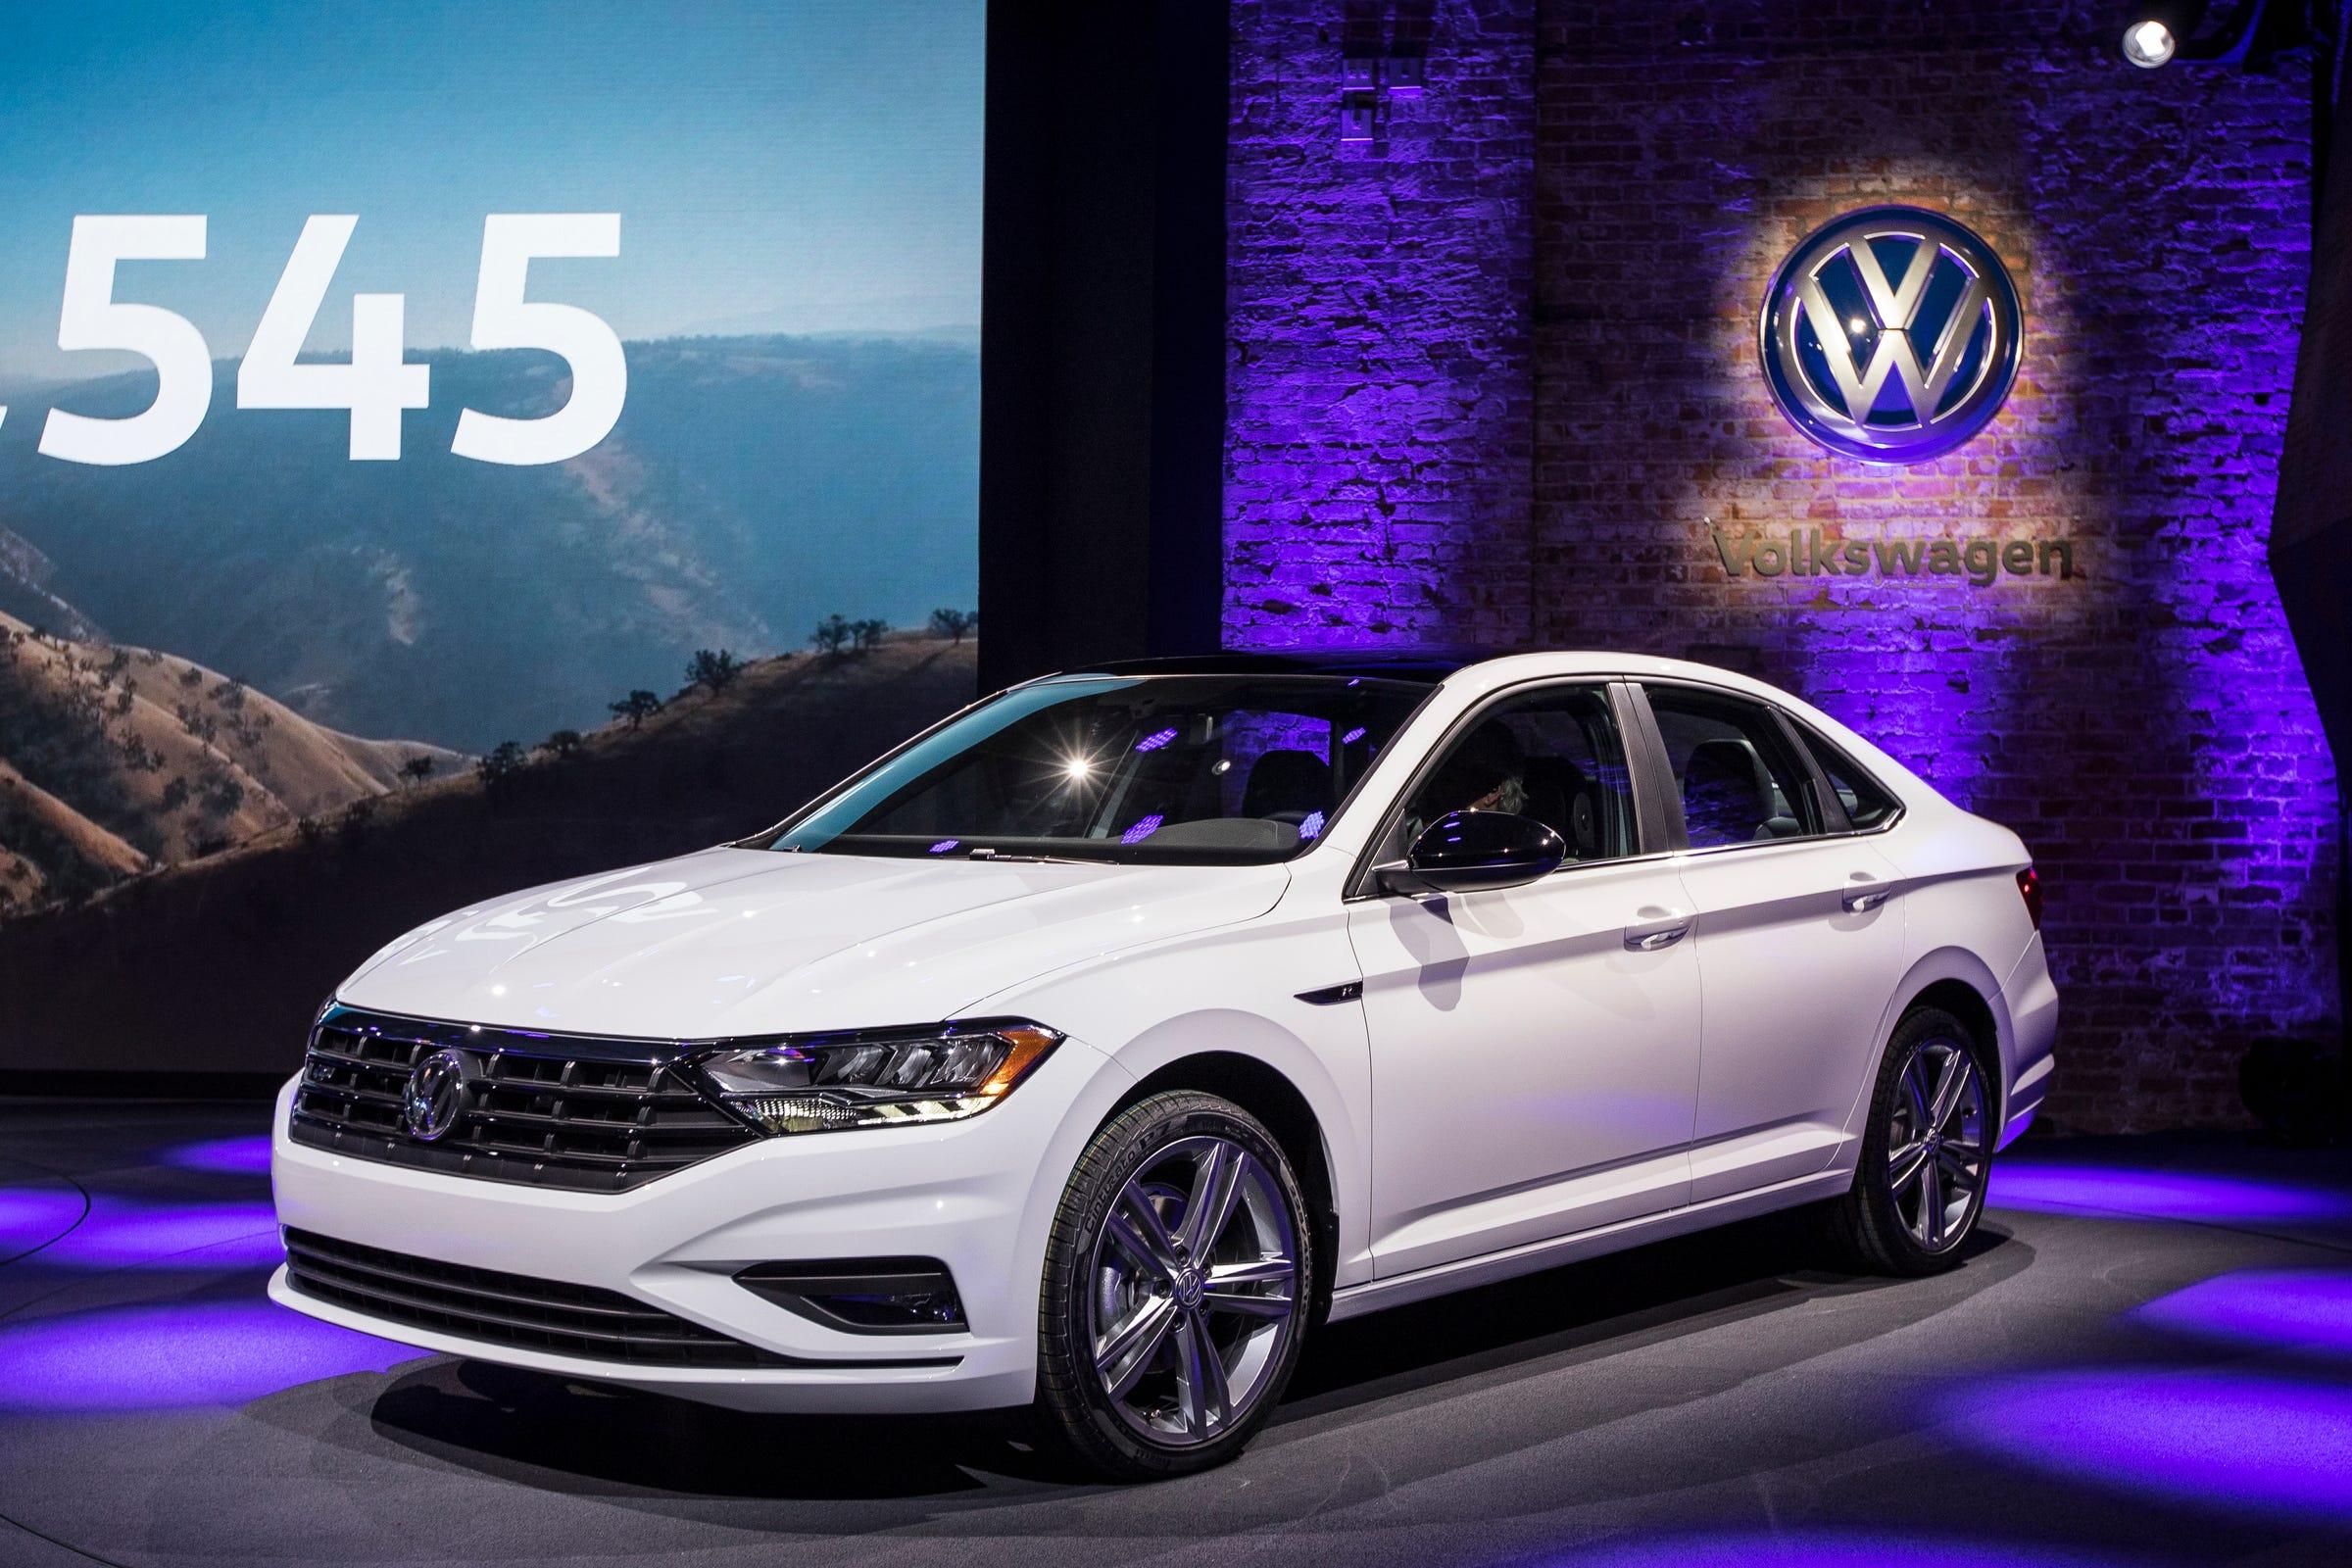 king5.com | Detroit auto show photos: 2019 Volkswagen Jetta